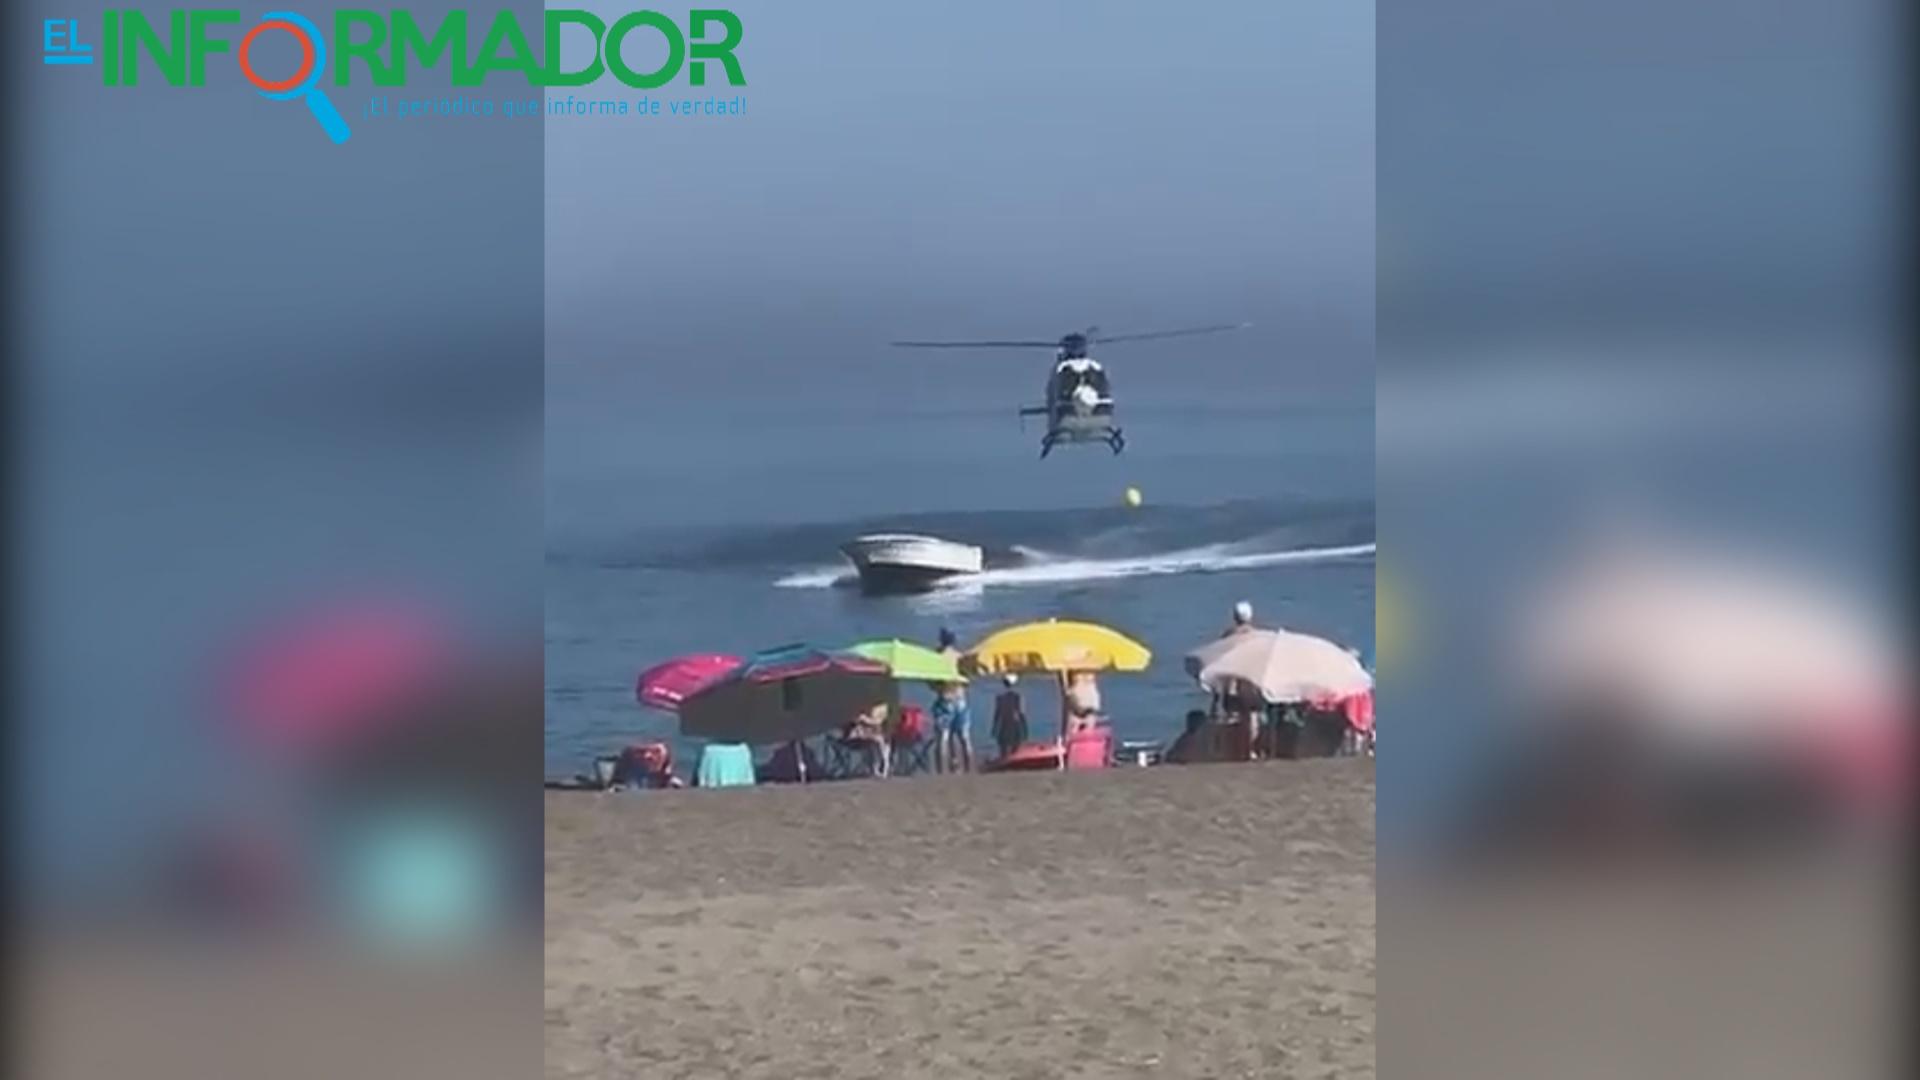 VIDEO: 'Narcolancha' perseguida por un helicóptero de la policía sorprende a bañistas en España